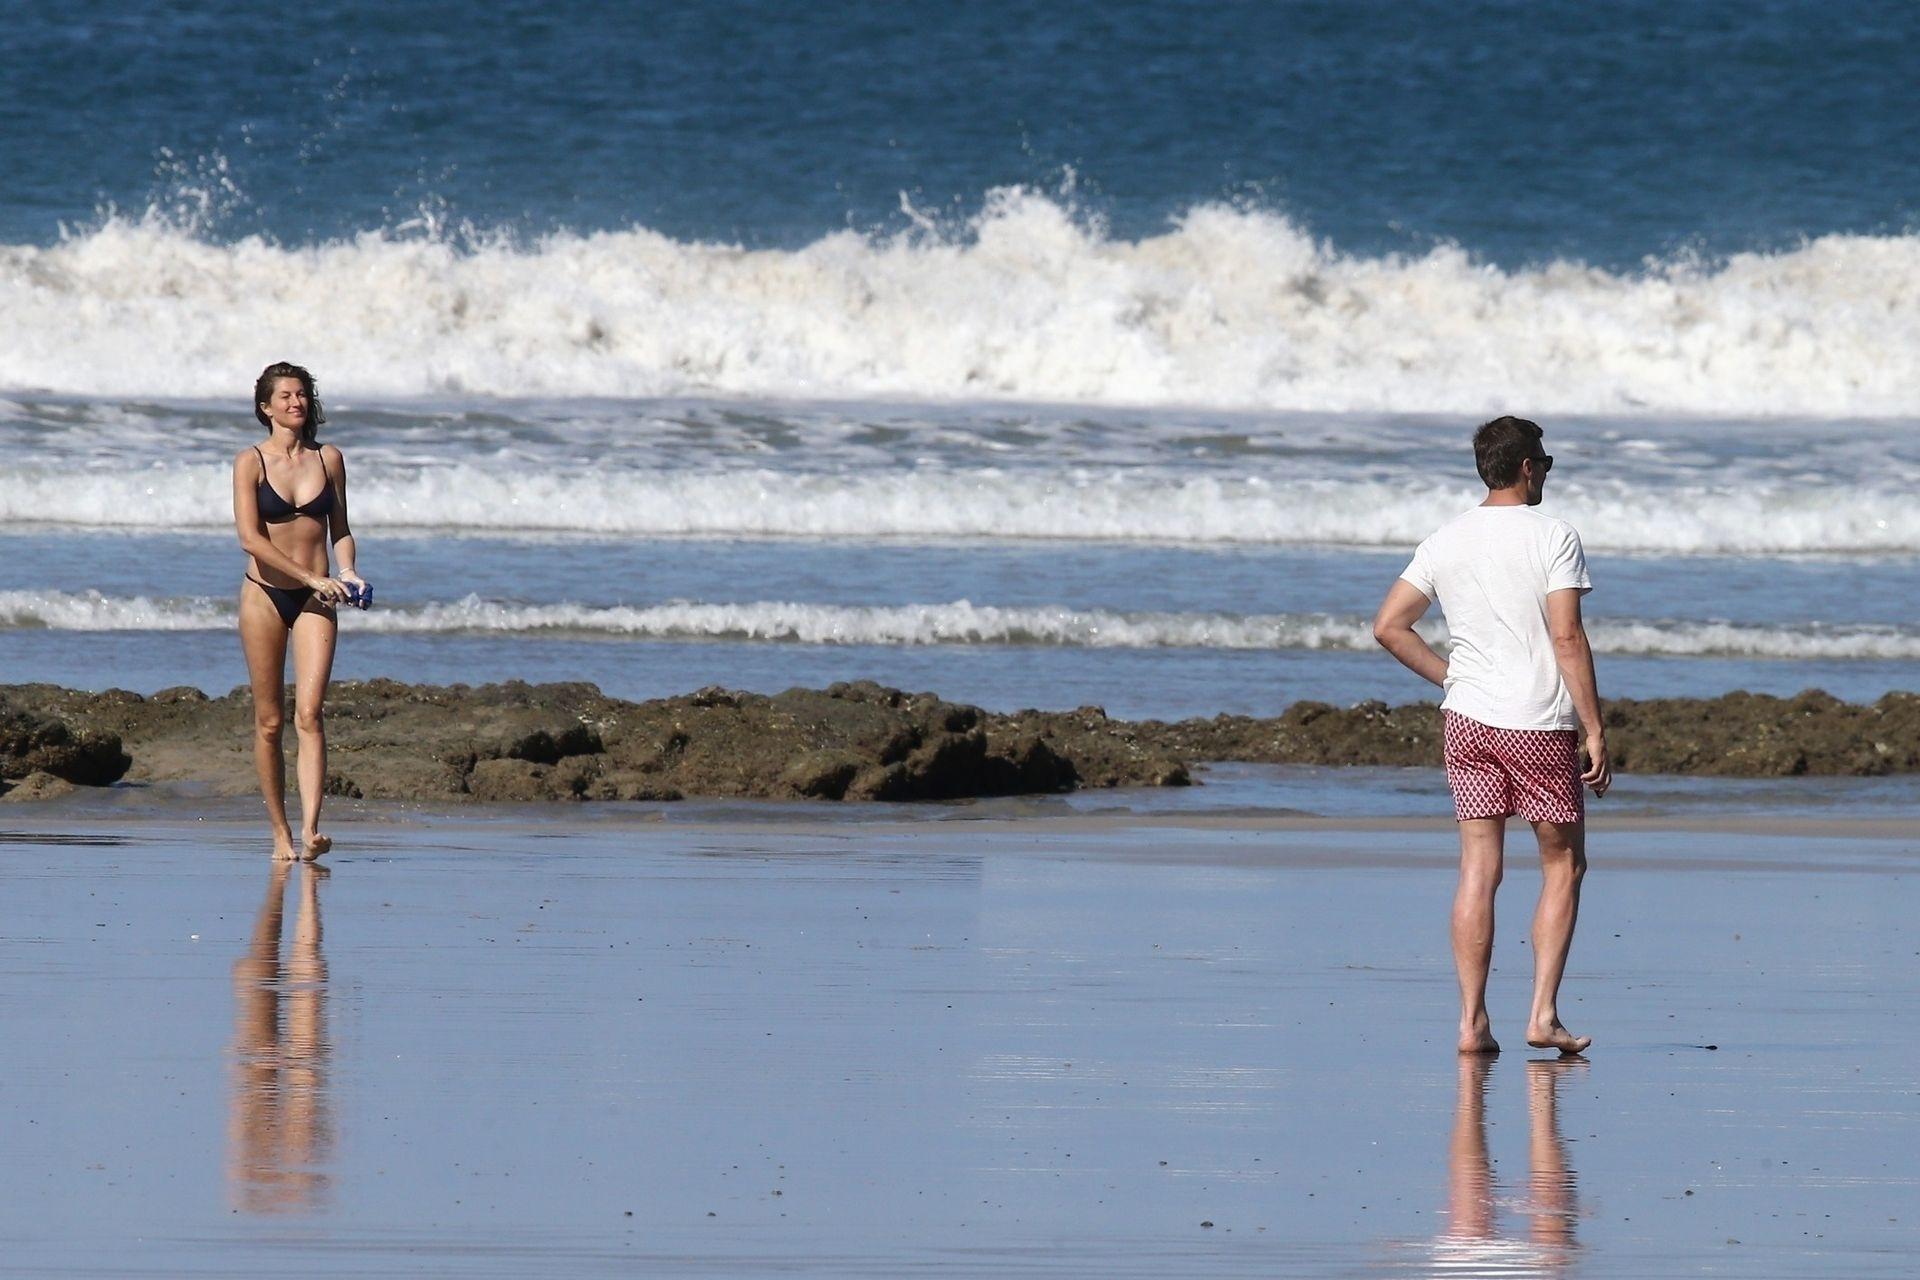 Tom Brady & Gisele Bundchen Pack On The Pda At The Beach 0014